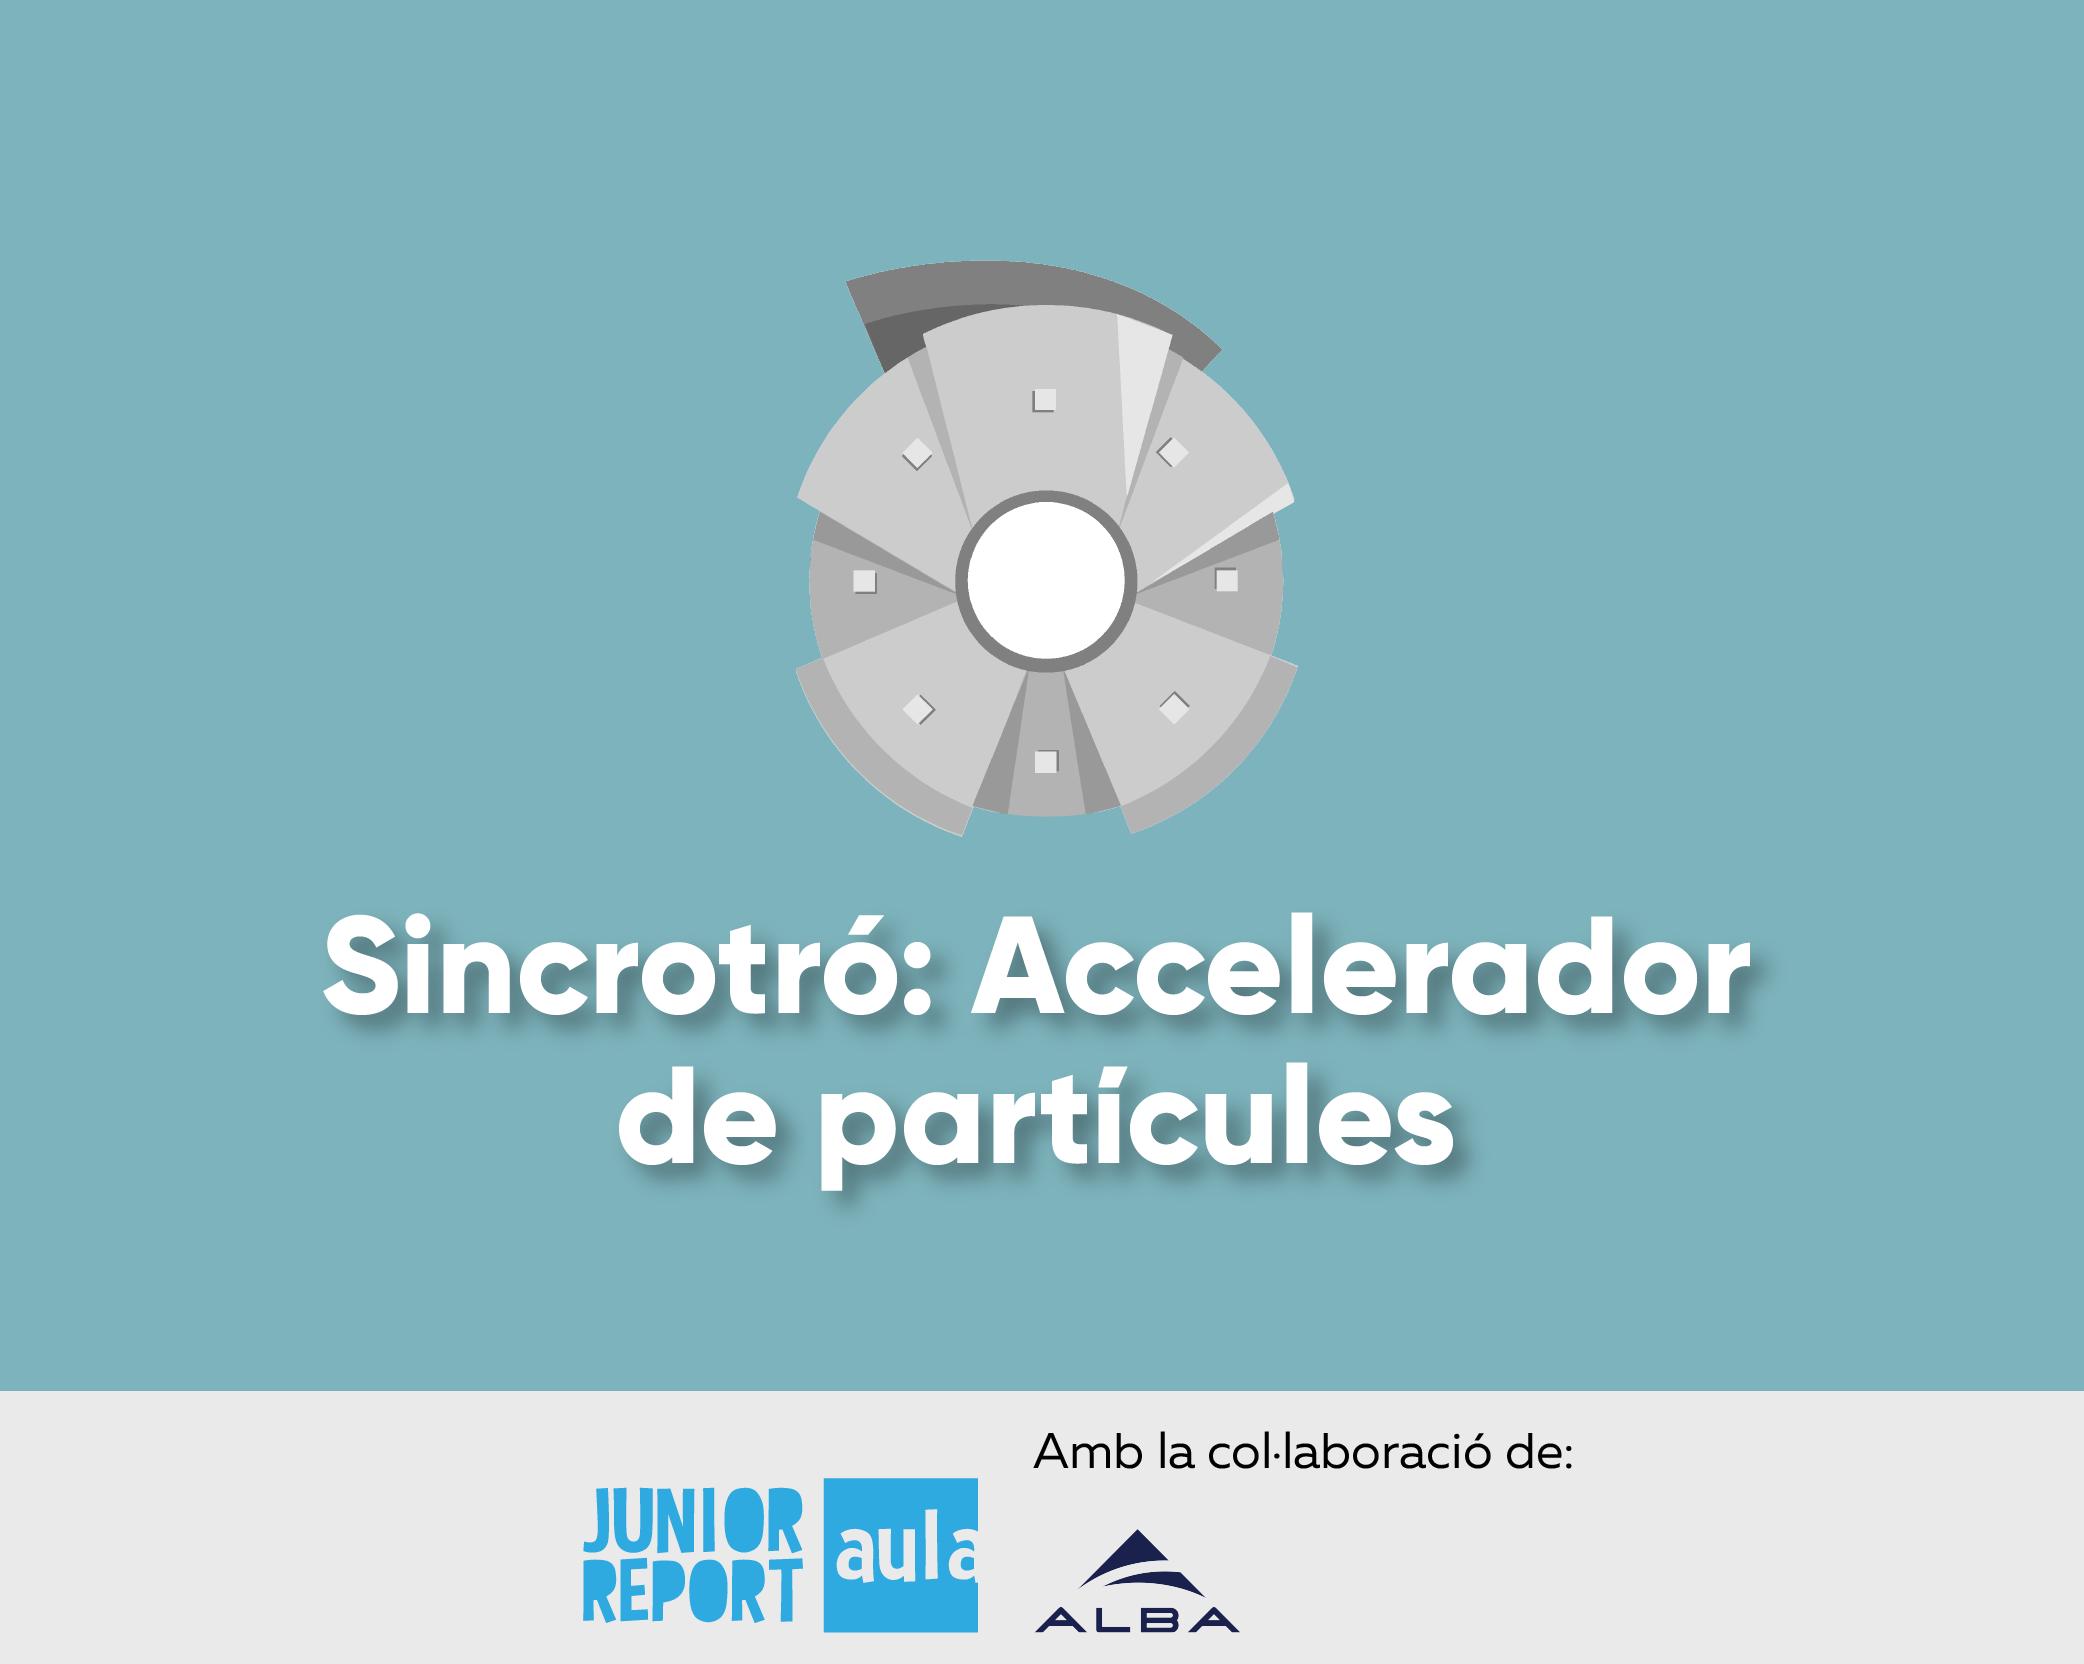 UD Sincrotró ALBA sobre l'accelerador de partícules